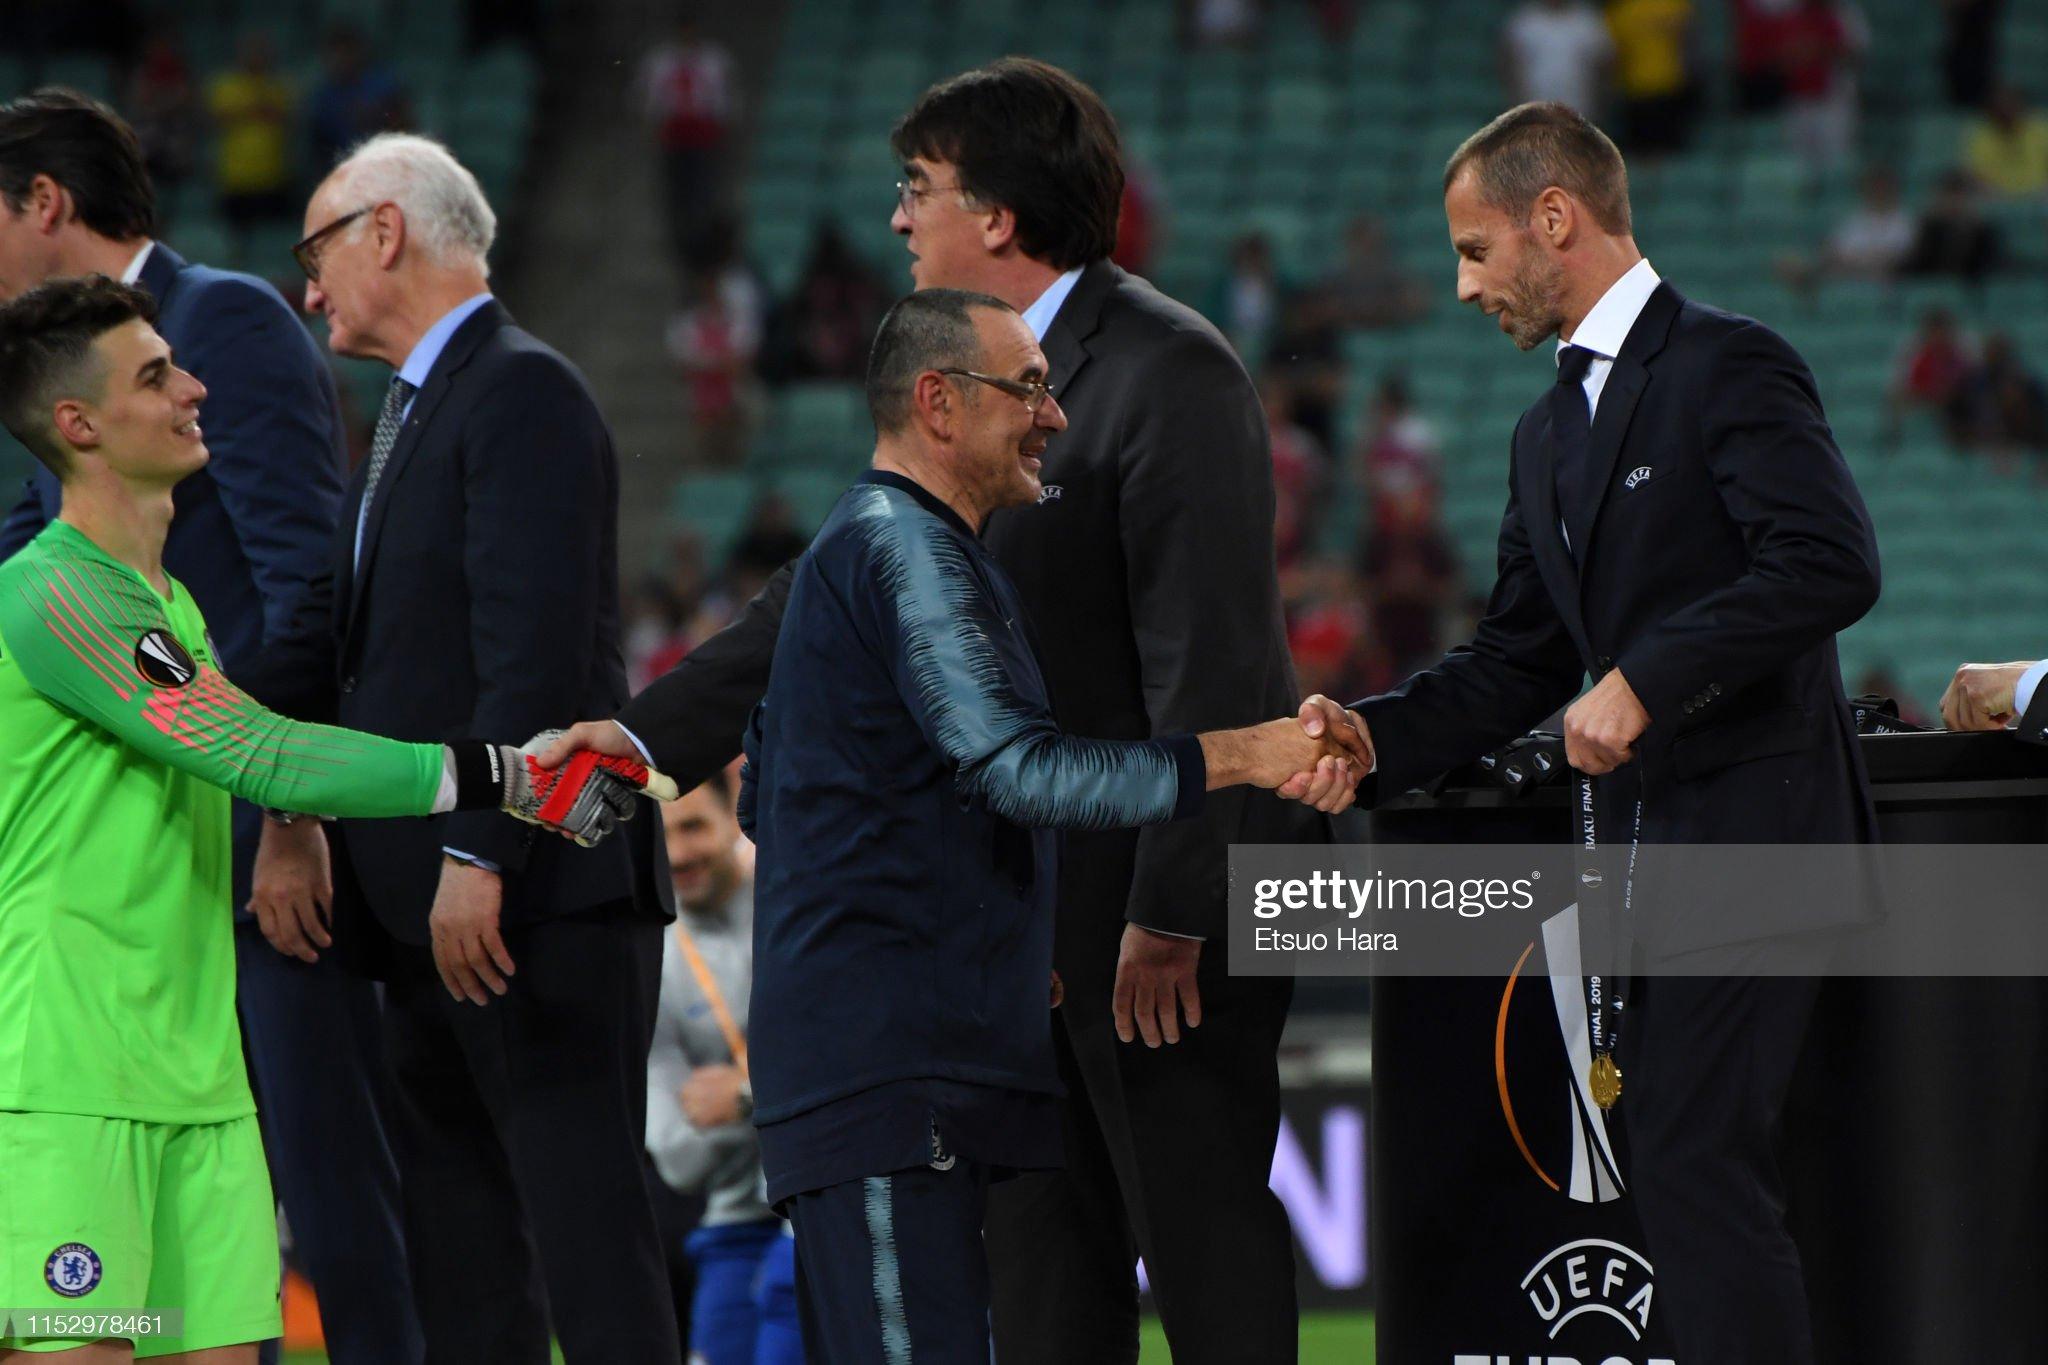 ¿Cuánto mide Maurizio Sarri? - Altura - Real height Chelsea-head-coach-maurizio-sarri-and-uefa-president-aleksander-picture-id1152978461?s=2048x2048